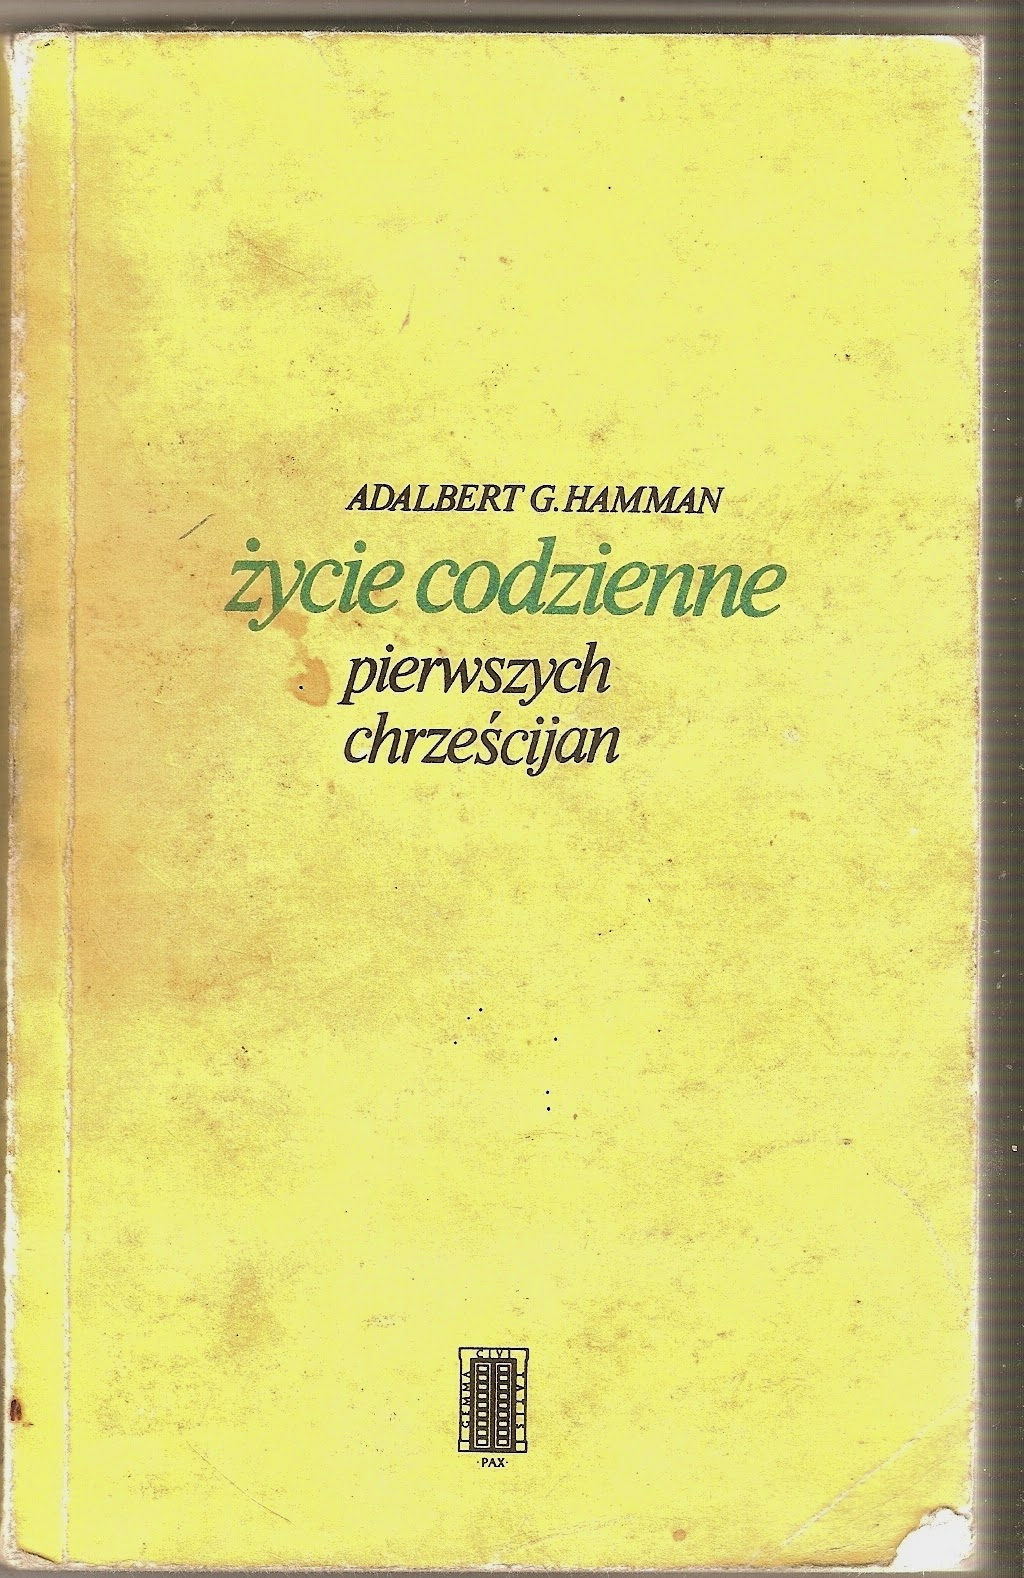 katolicki komentarz biblijny pdf chomikuj